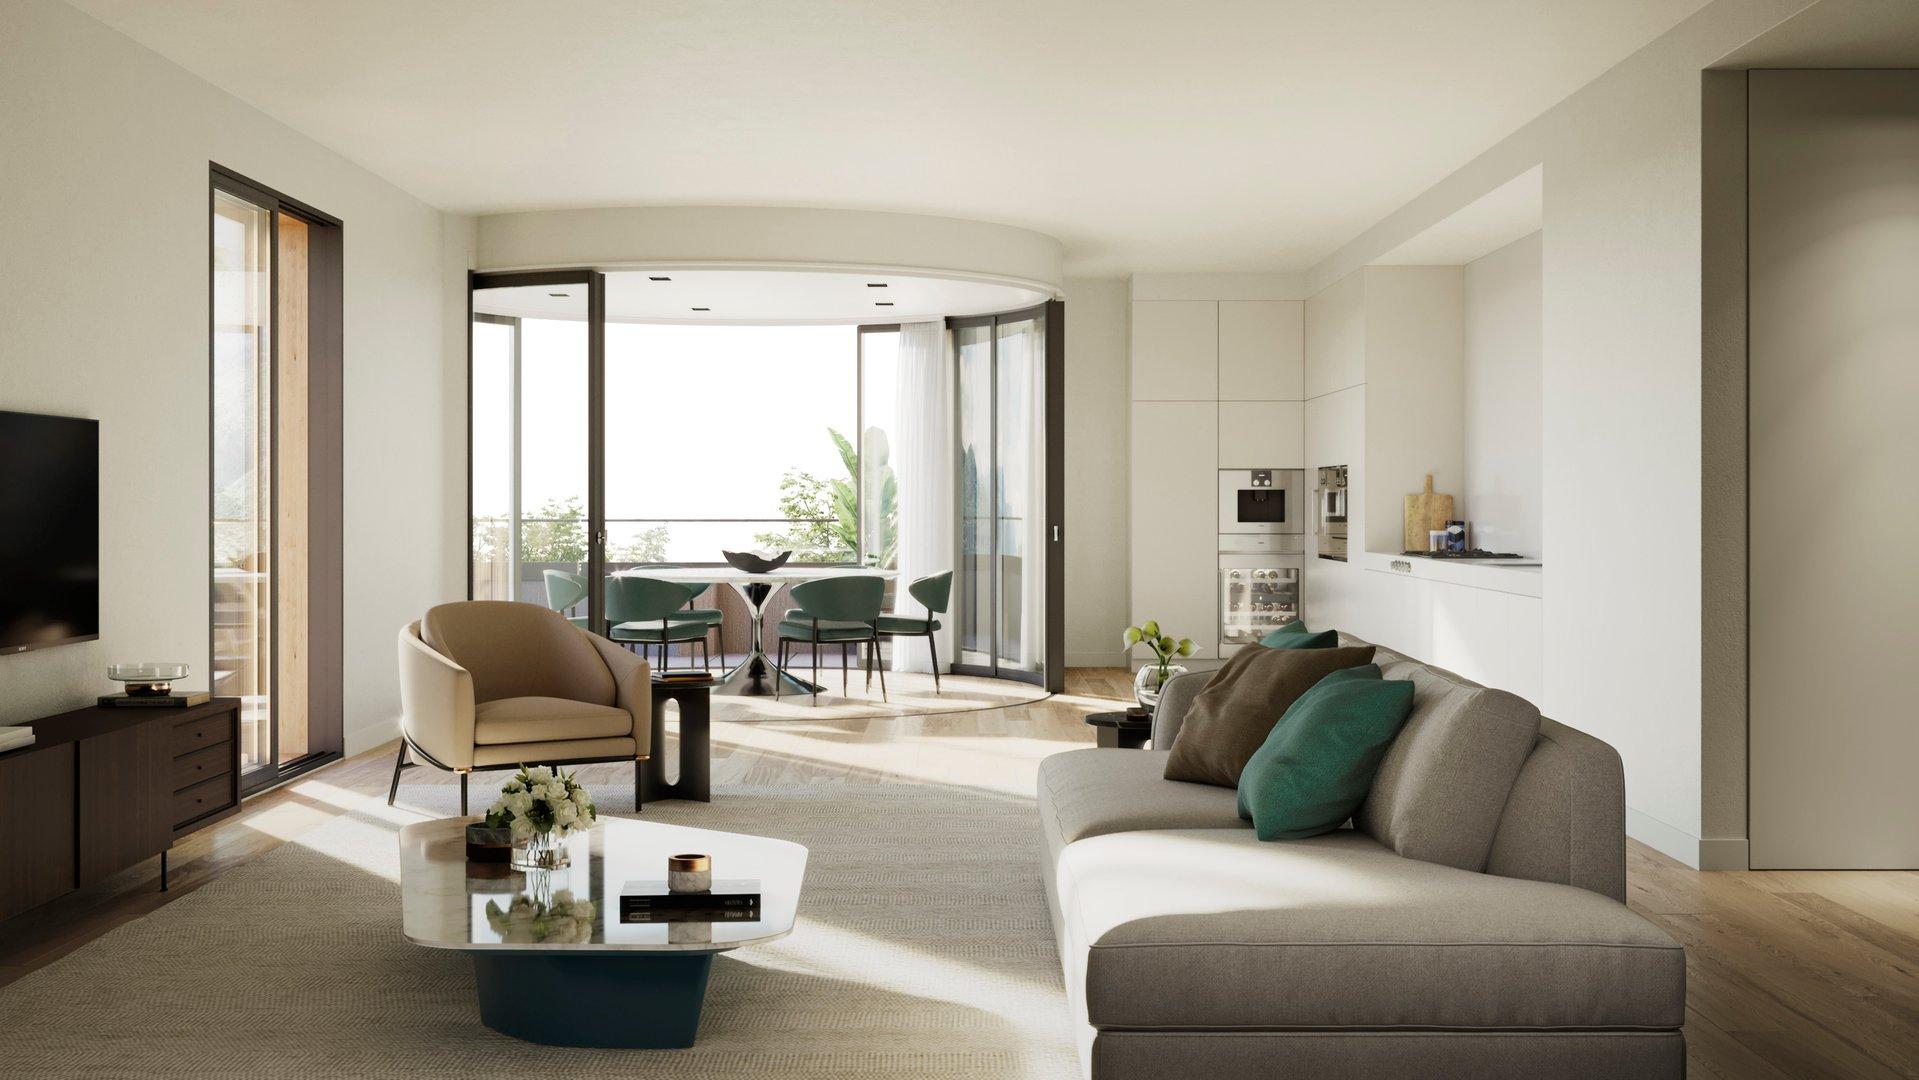 4P - 79 m² - PROGRAMME NEUF ANNECY